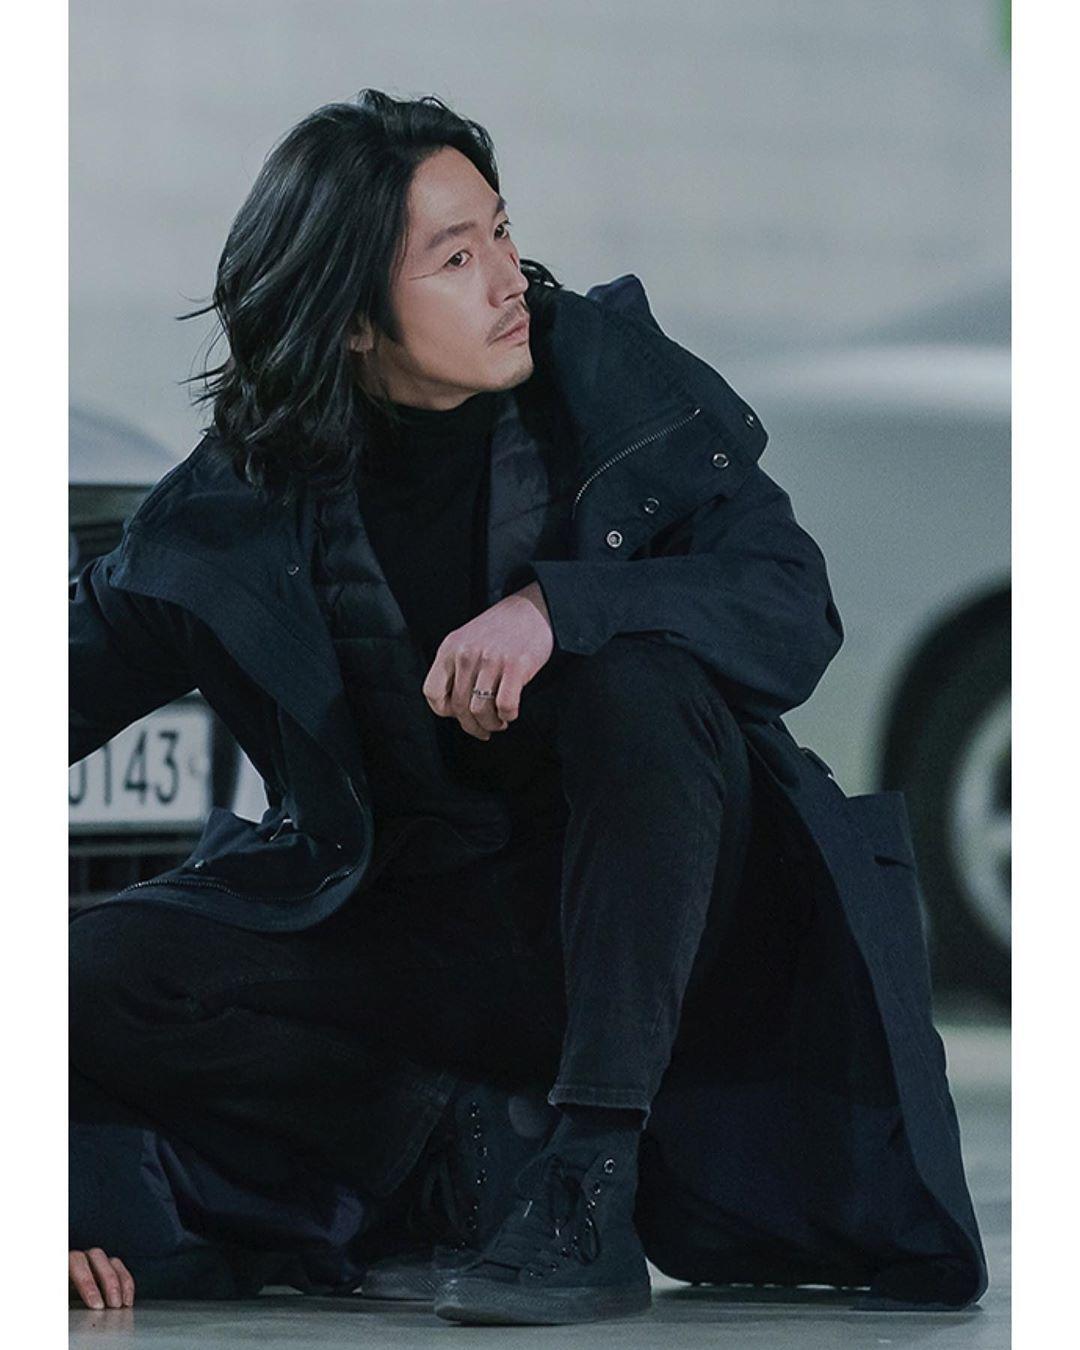 Pin by Shosho Kyu on kdrama in 2020 | Asian actors, Korean actors, Asian men long hair